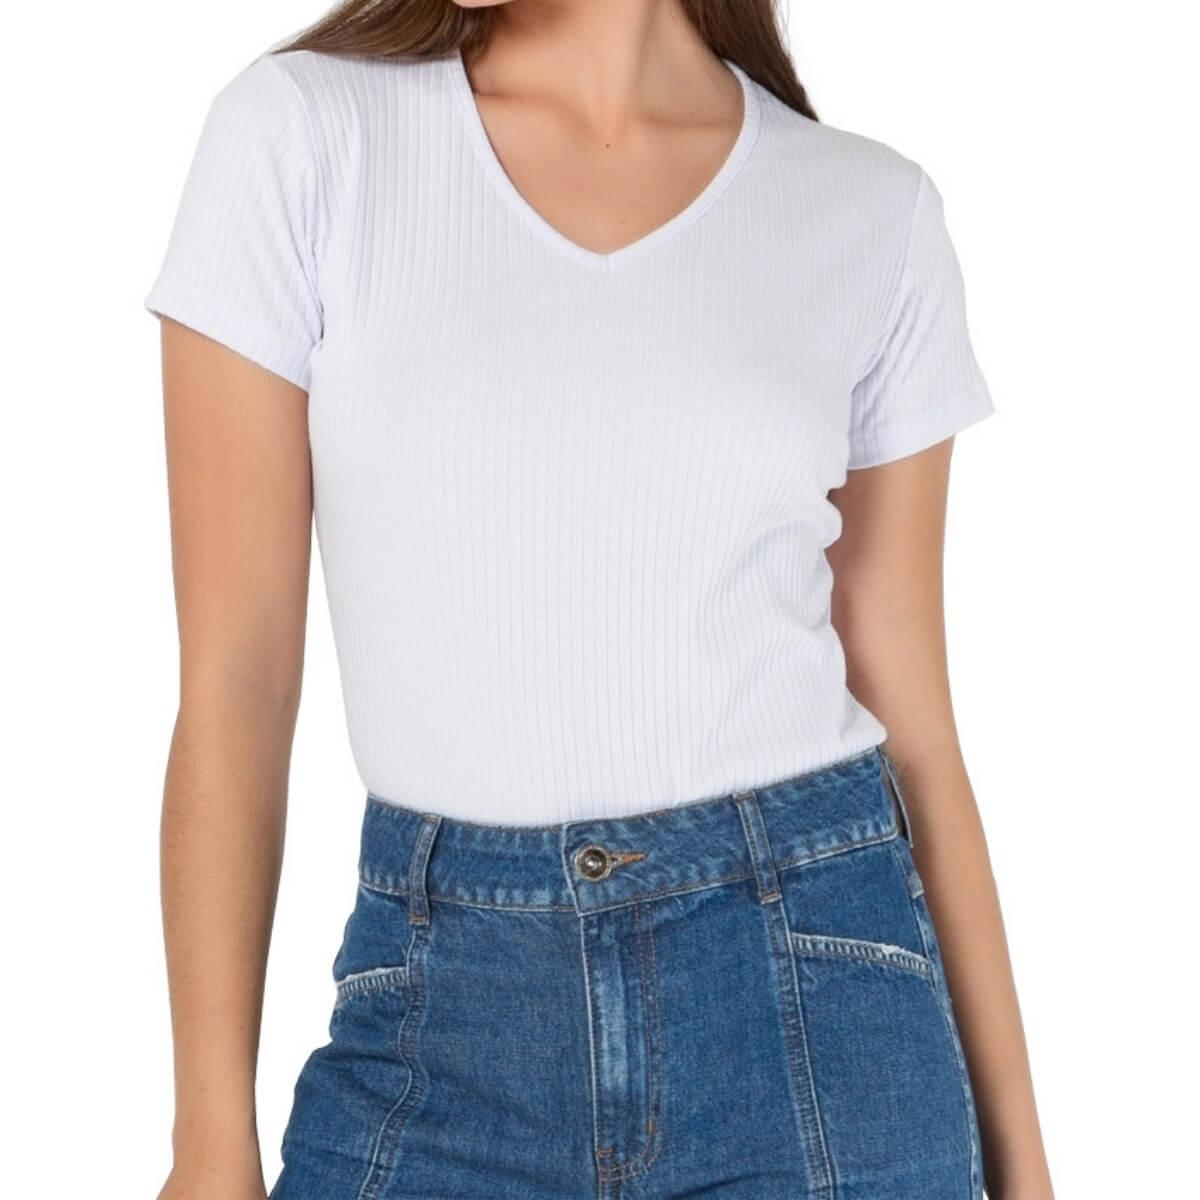 Camiseta Feminina Ribana Premium Branca